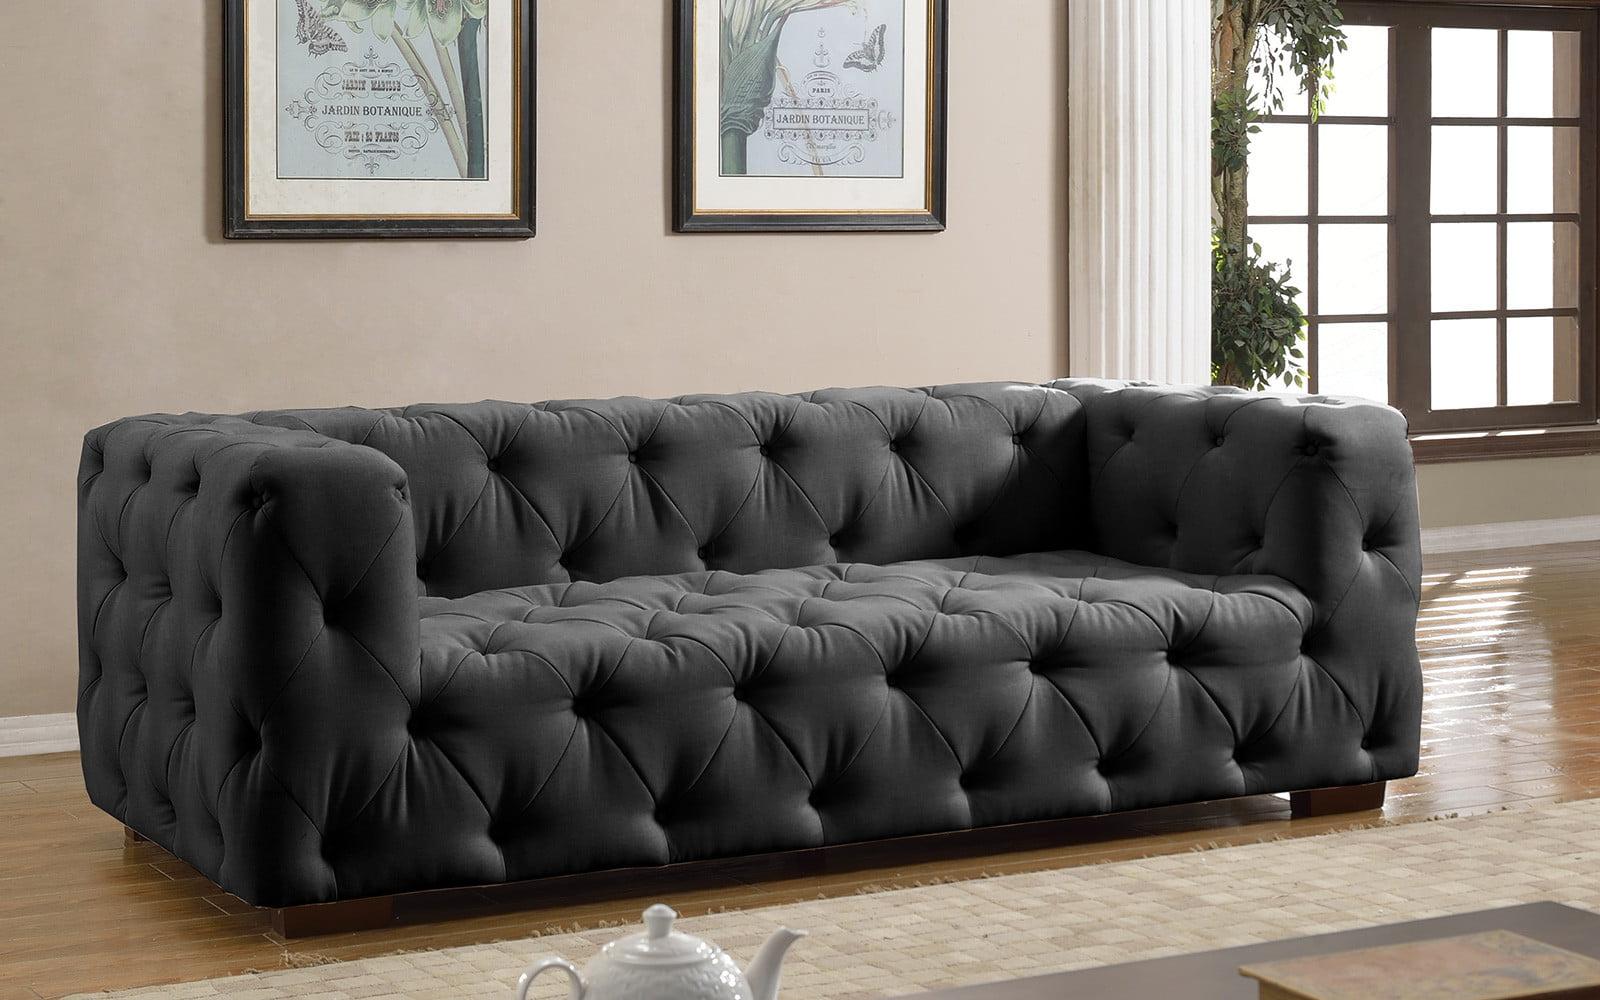 Very Luxurious Modern Large Tufted Linen Fabric Sofa - Walmart.com EF52